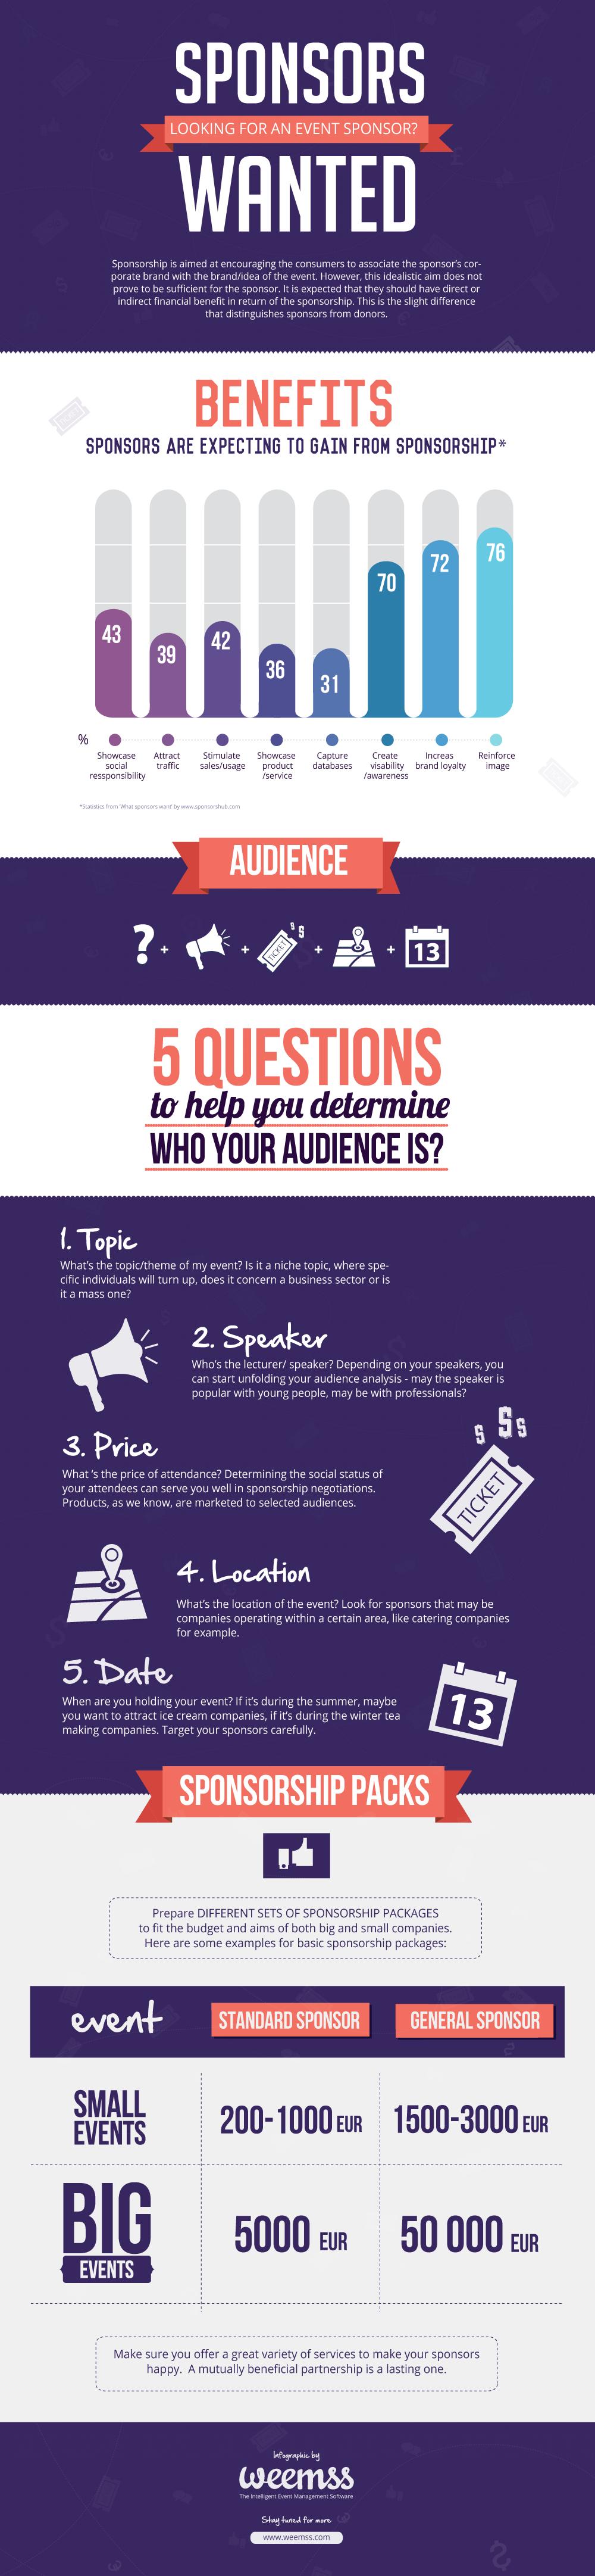 Sponsorship Guide How To Procure Sponsorships Infographic Event Sponsorship Sponsorship Program Sponsorship